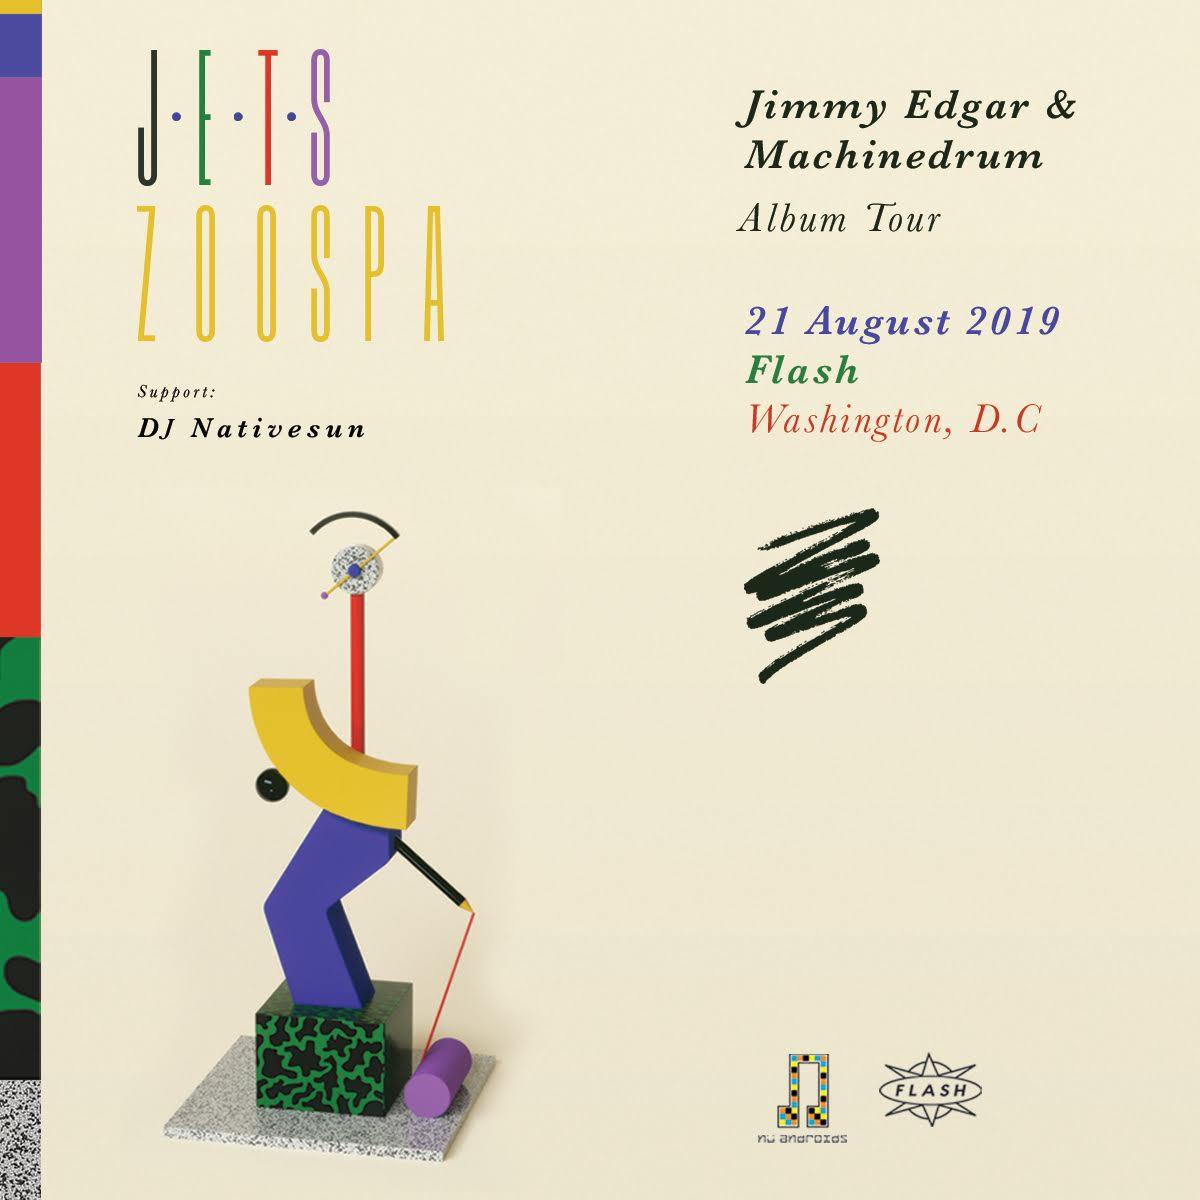 JETS [Jimmy Edgar + Machinedrum] event thumbnail